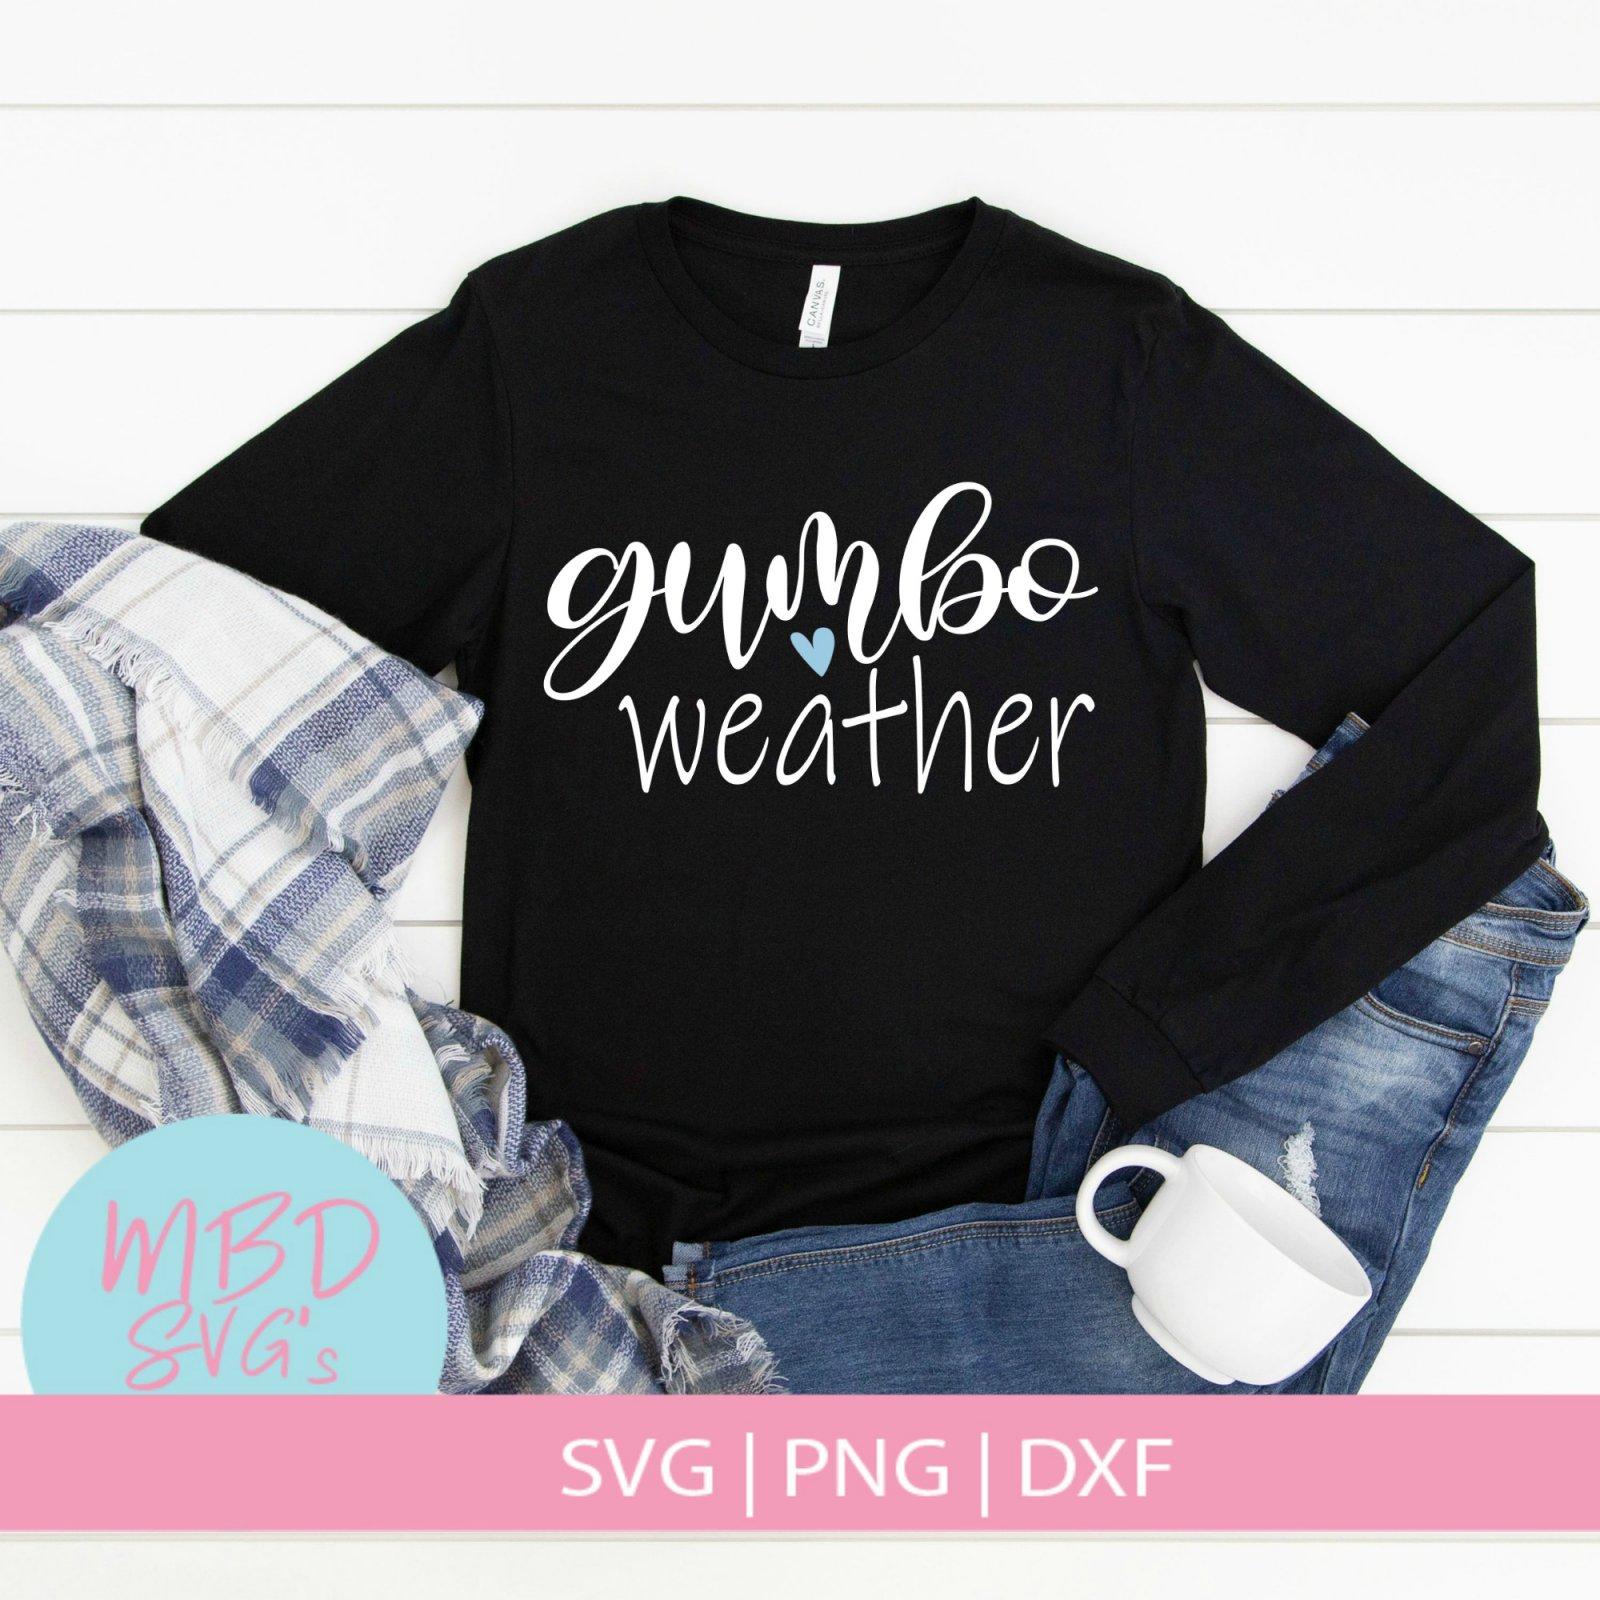 Gumbo Weather SVG, Louisiana SVG